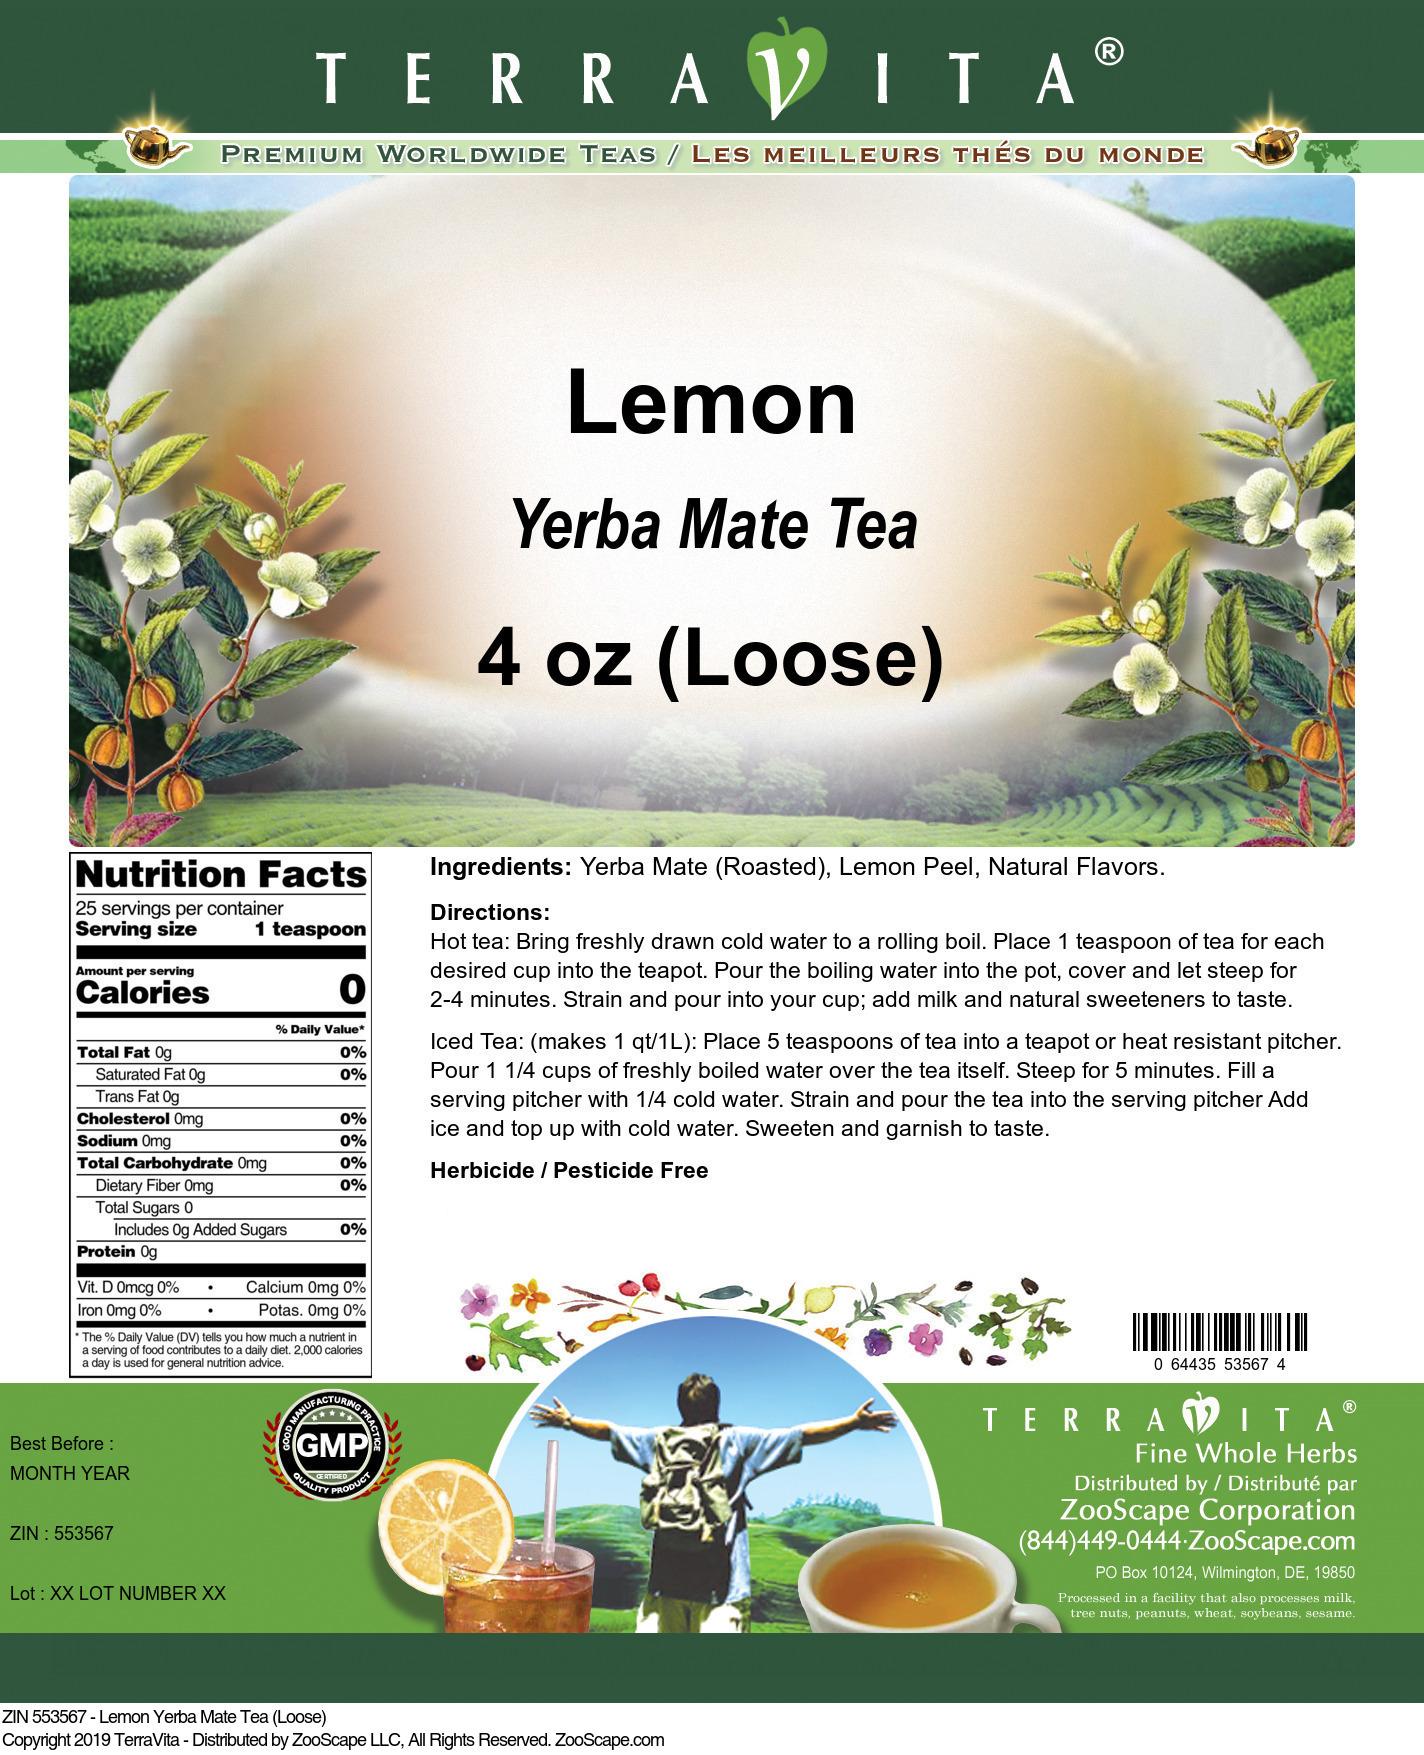 Lemon Yerba Mate